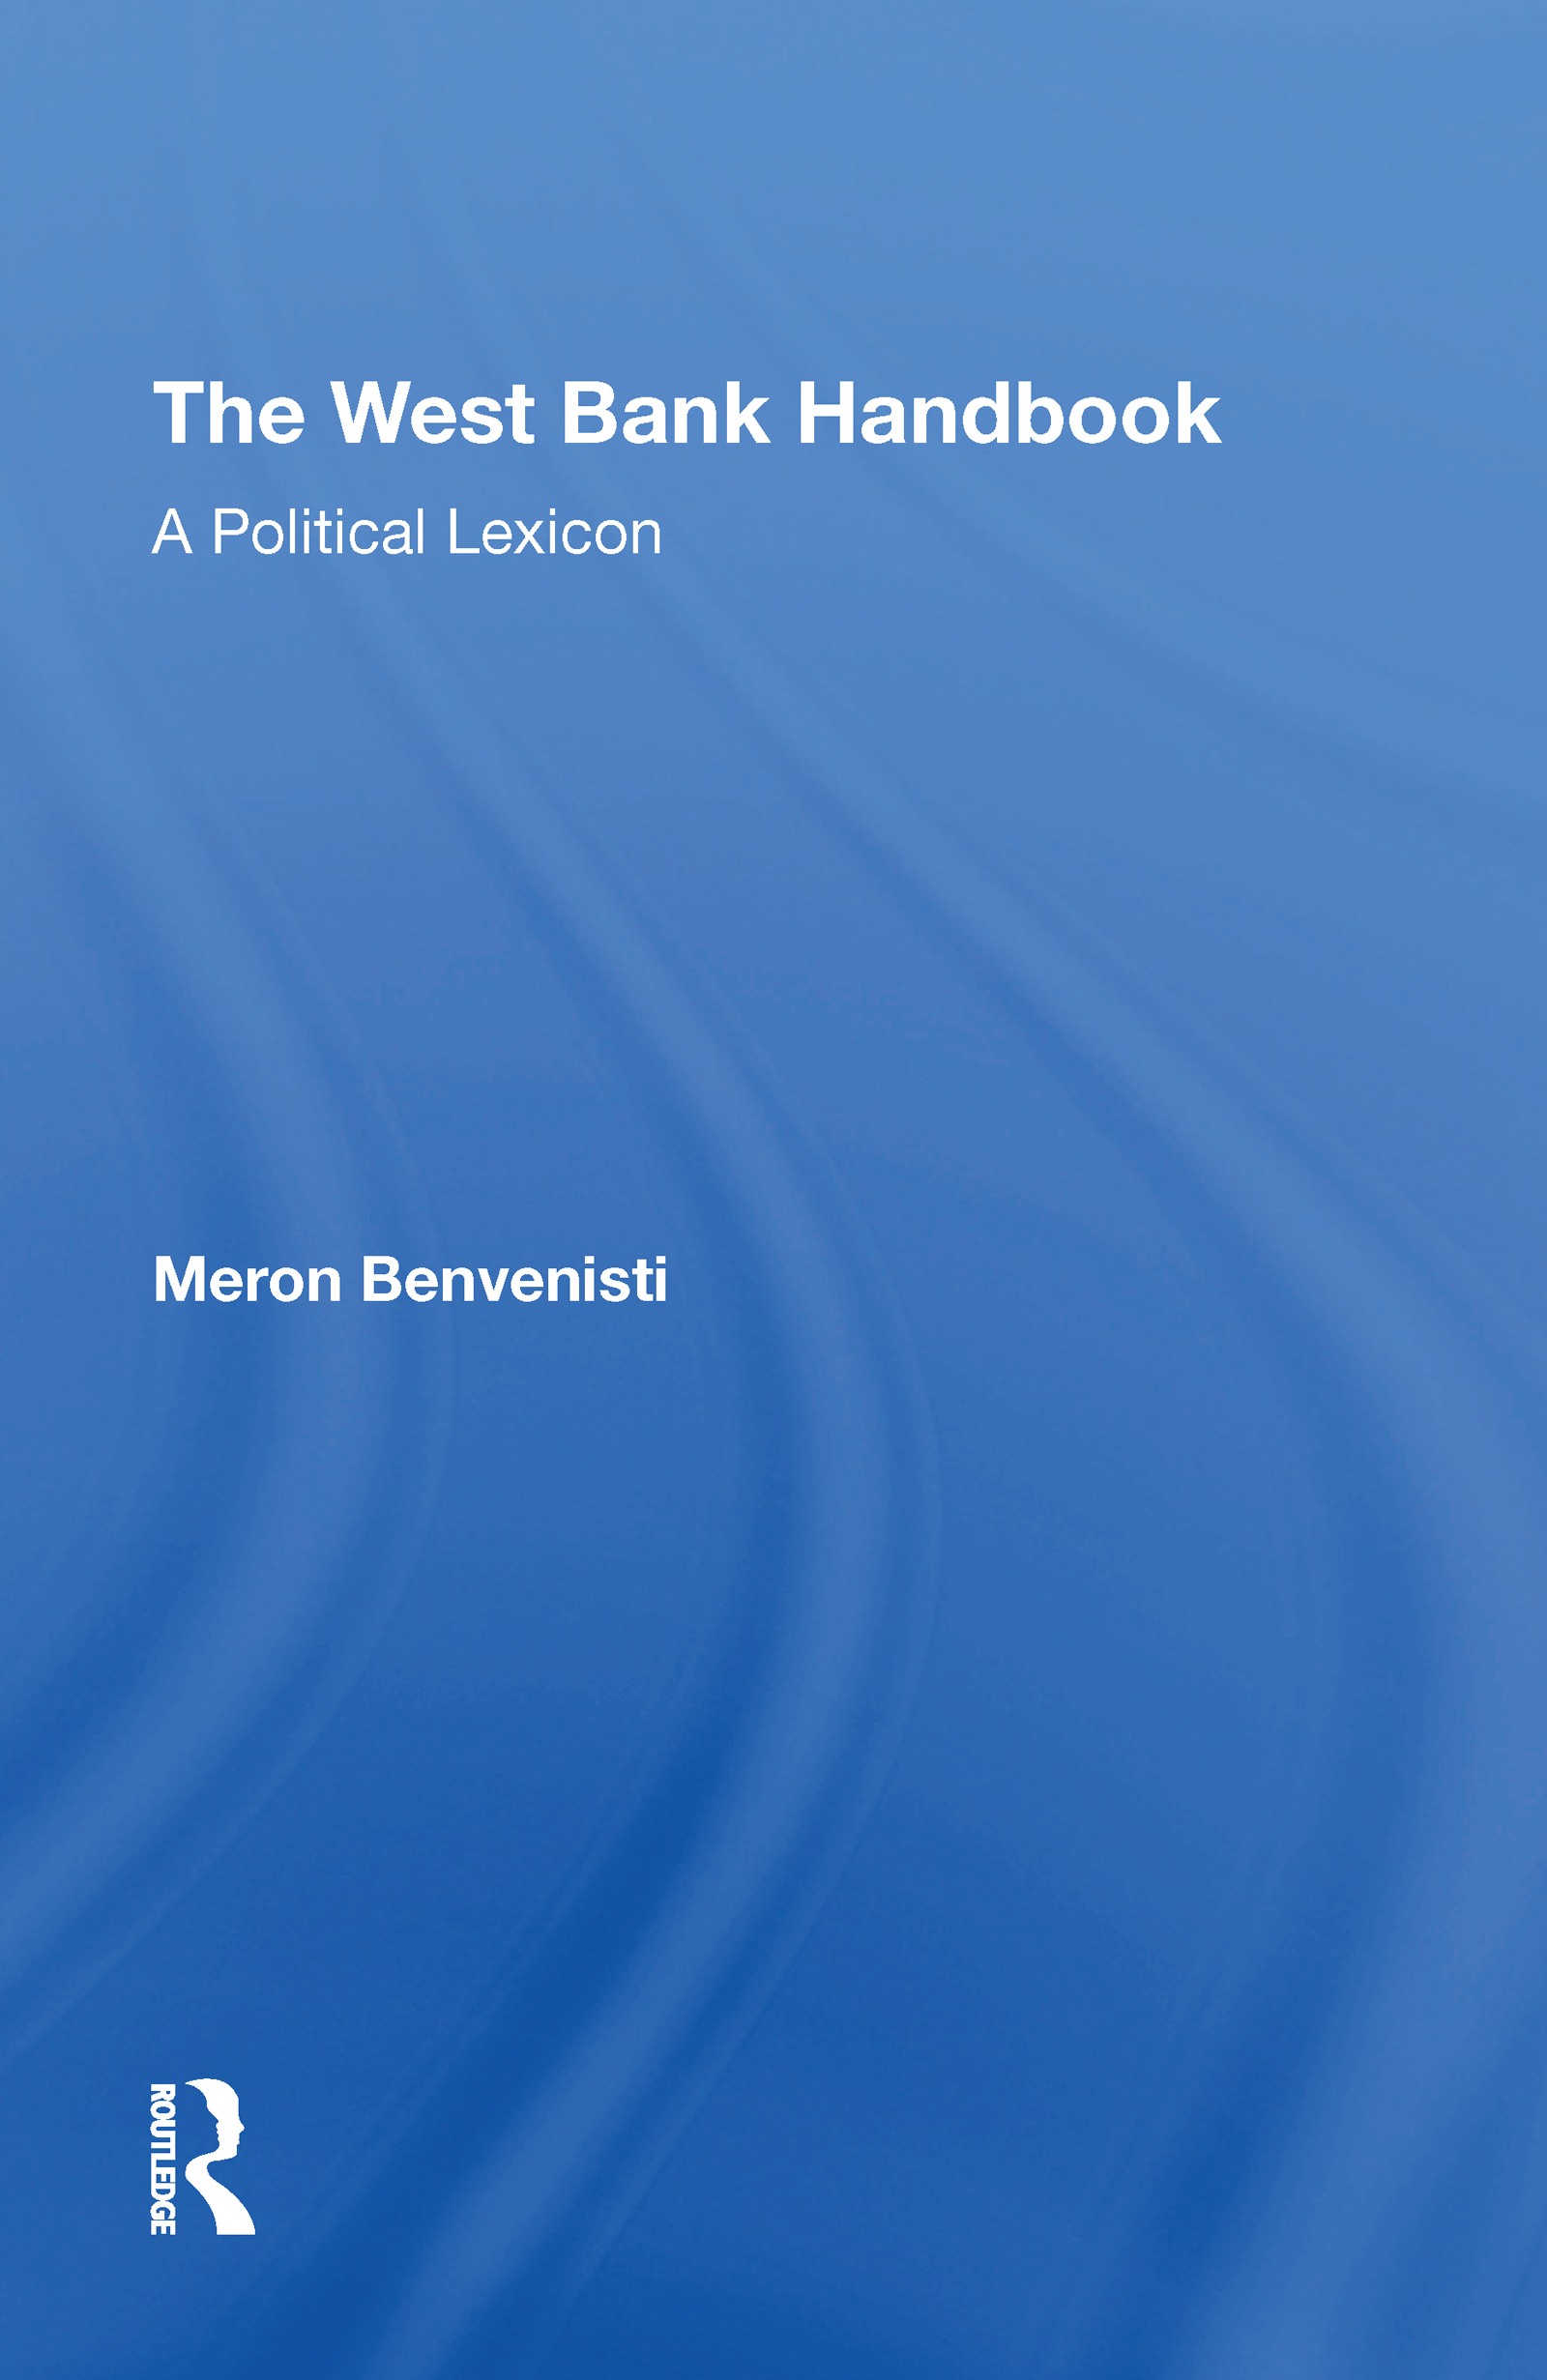 The West Bank Handbook